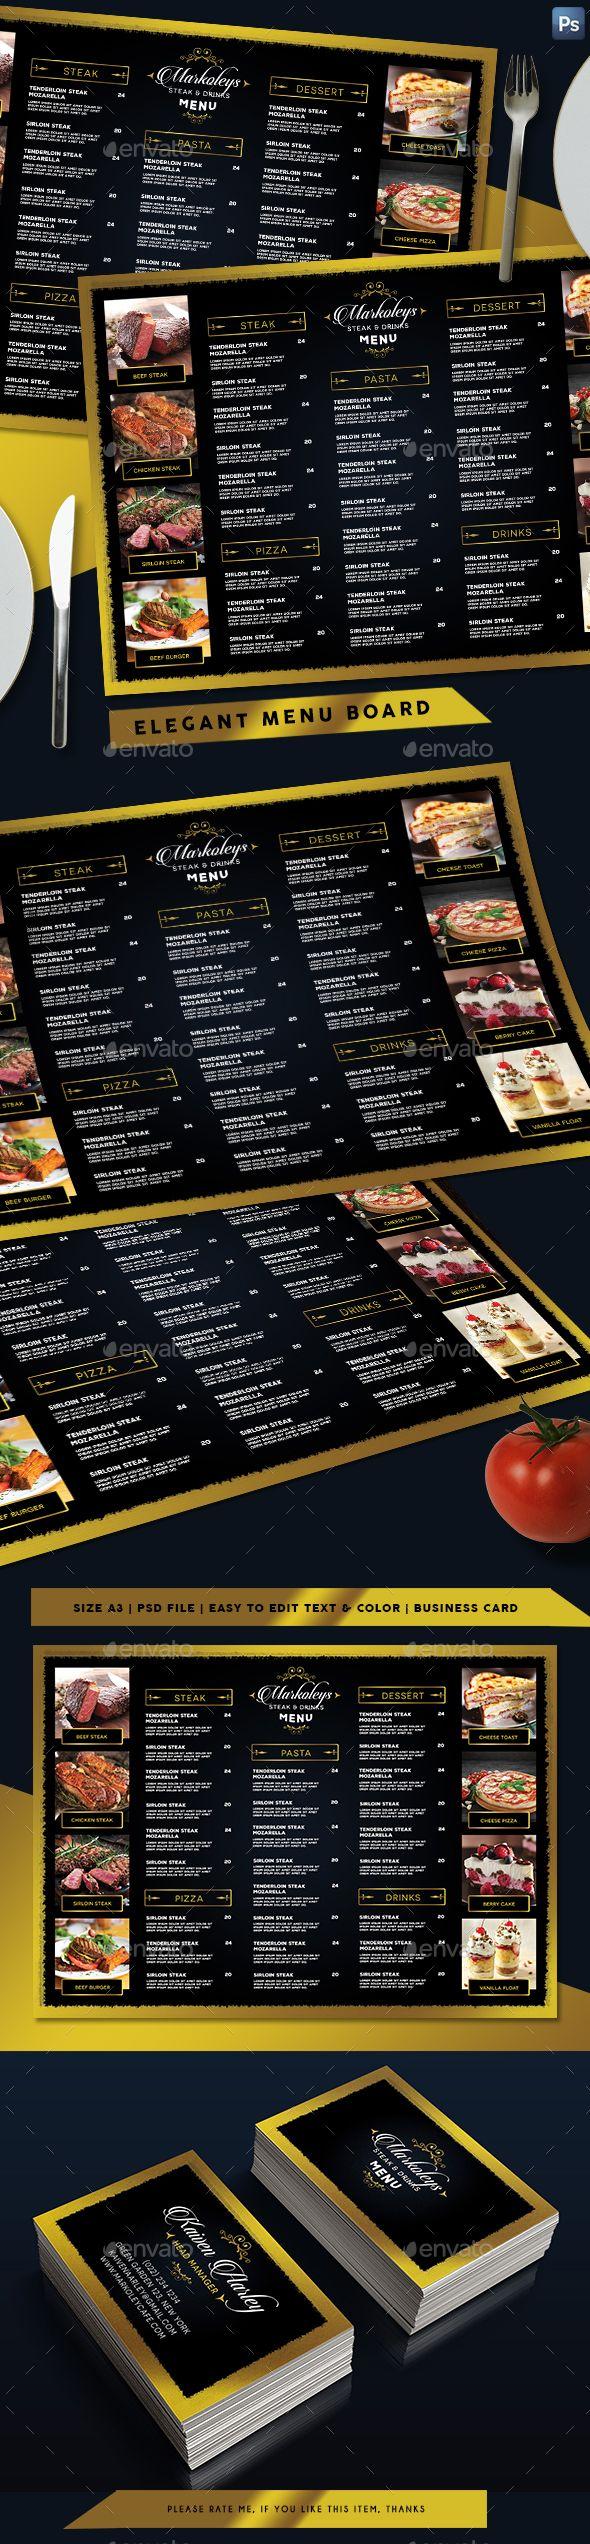 Elegant Restaurant Menu Board + Business Card - Templates PSD